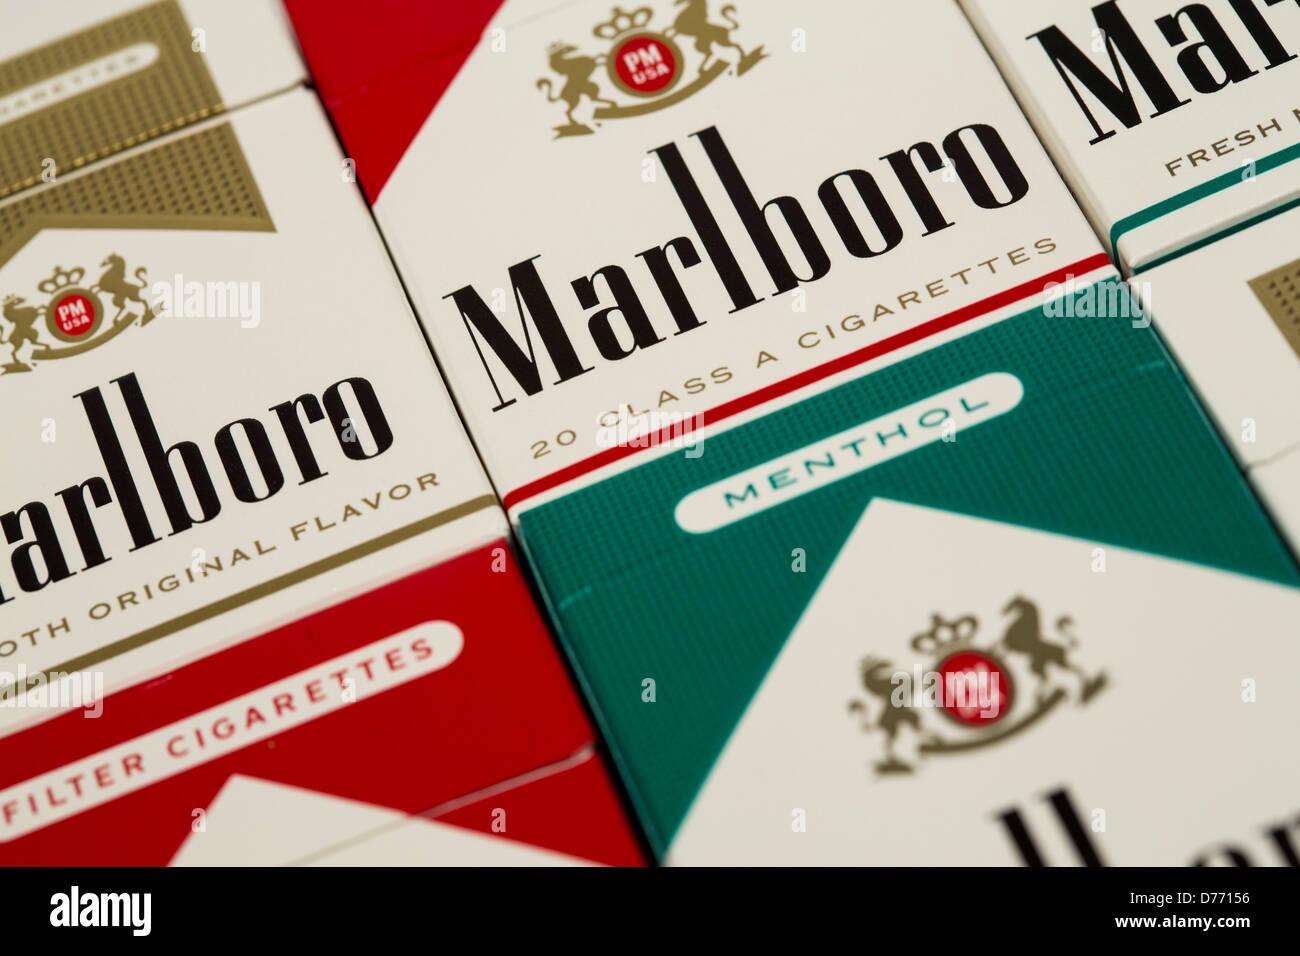 Buy Kent cigarettes wholesale UK